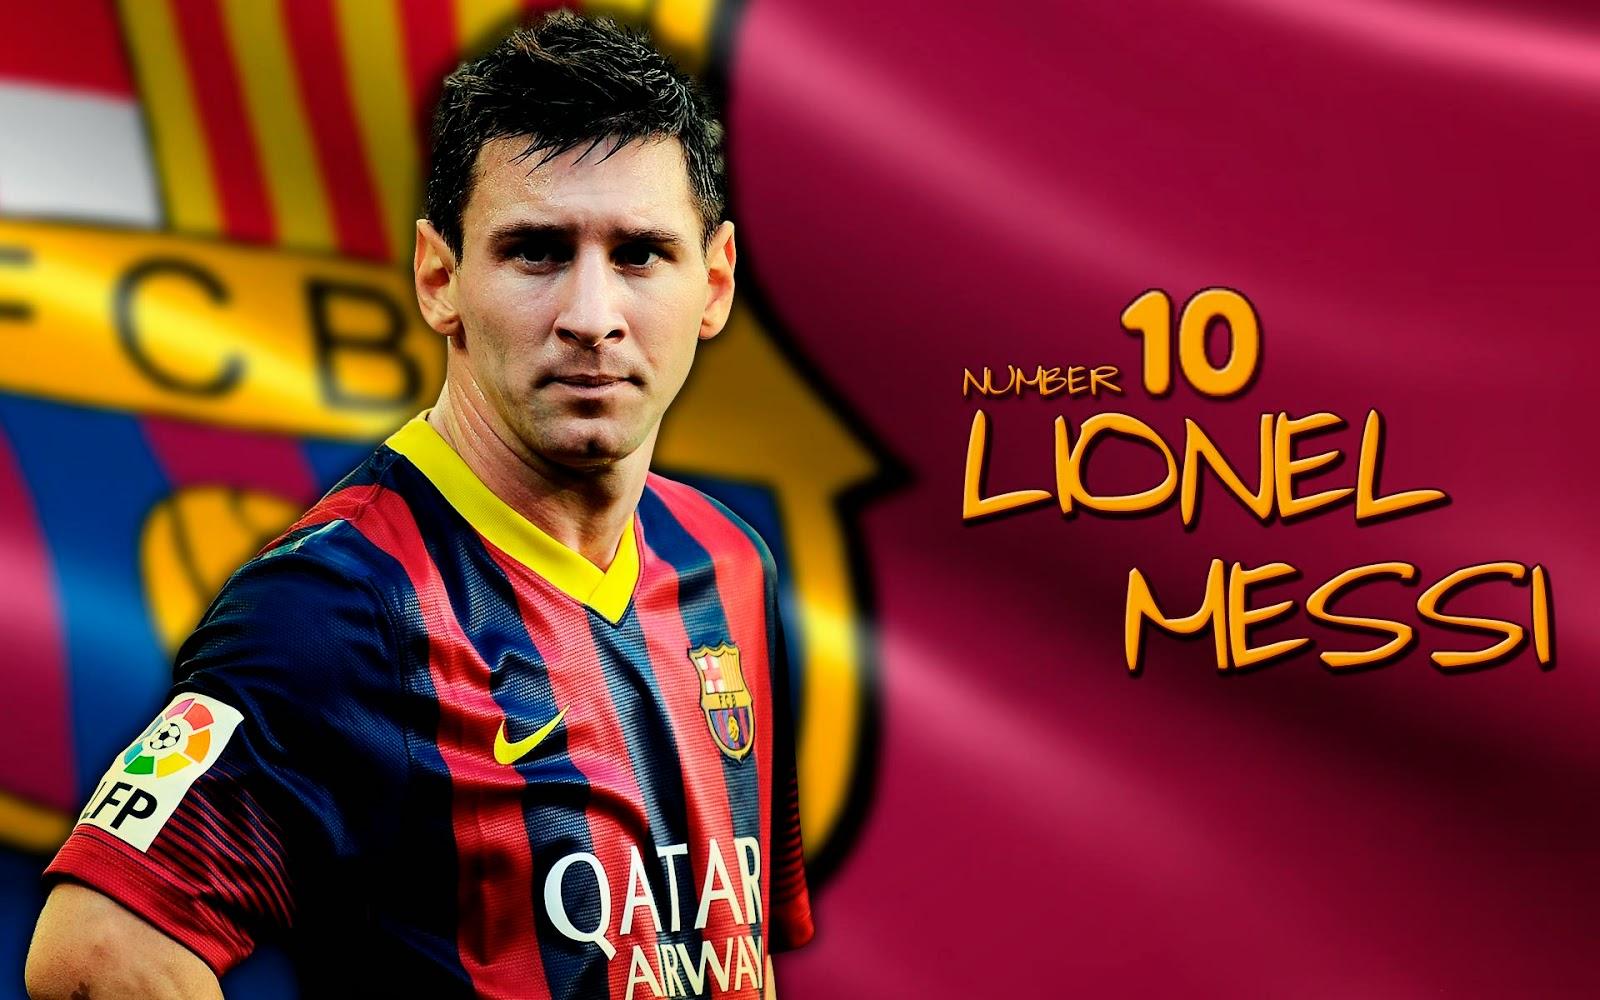 Wallpapers HD Corner Lionel Messi Fc Barcelona HD Wallpapers 2015 1600x1000